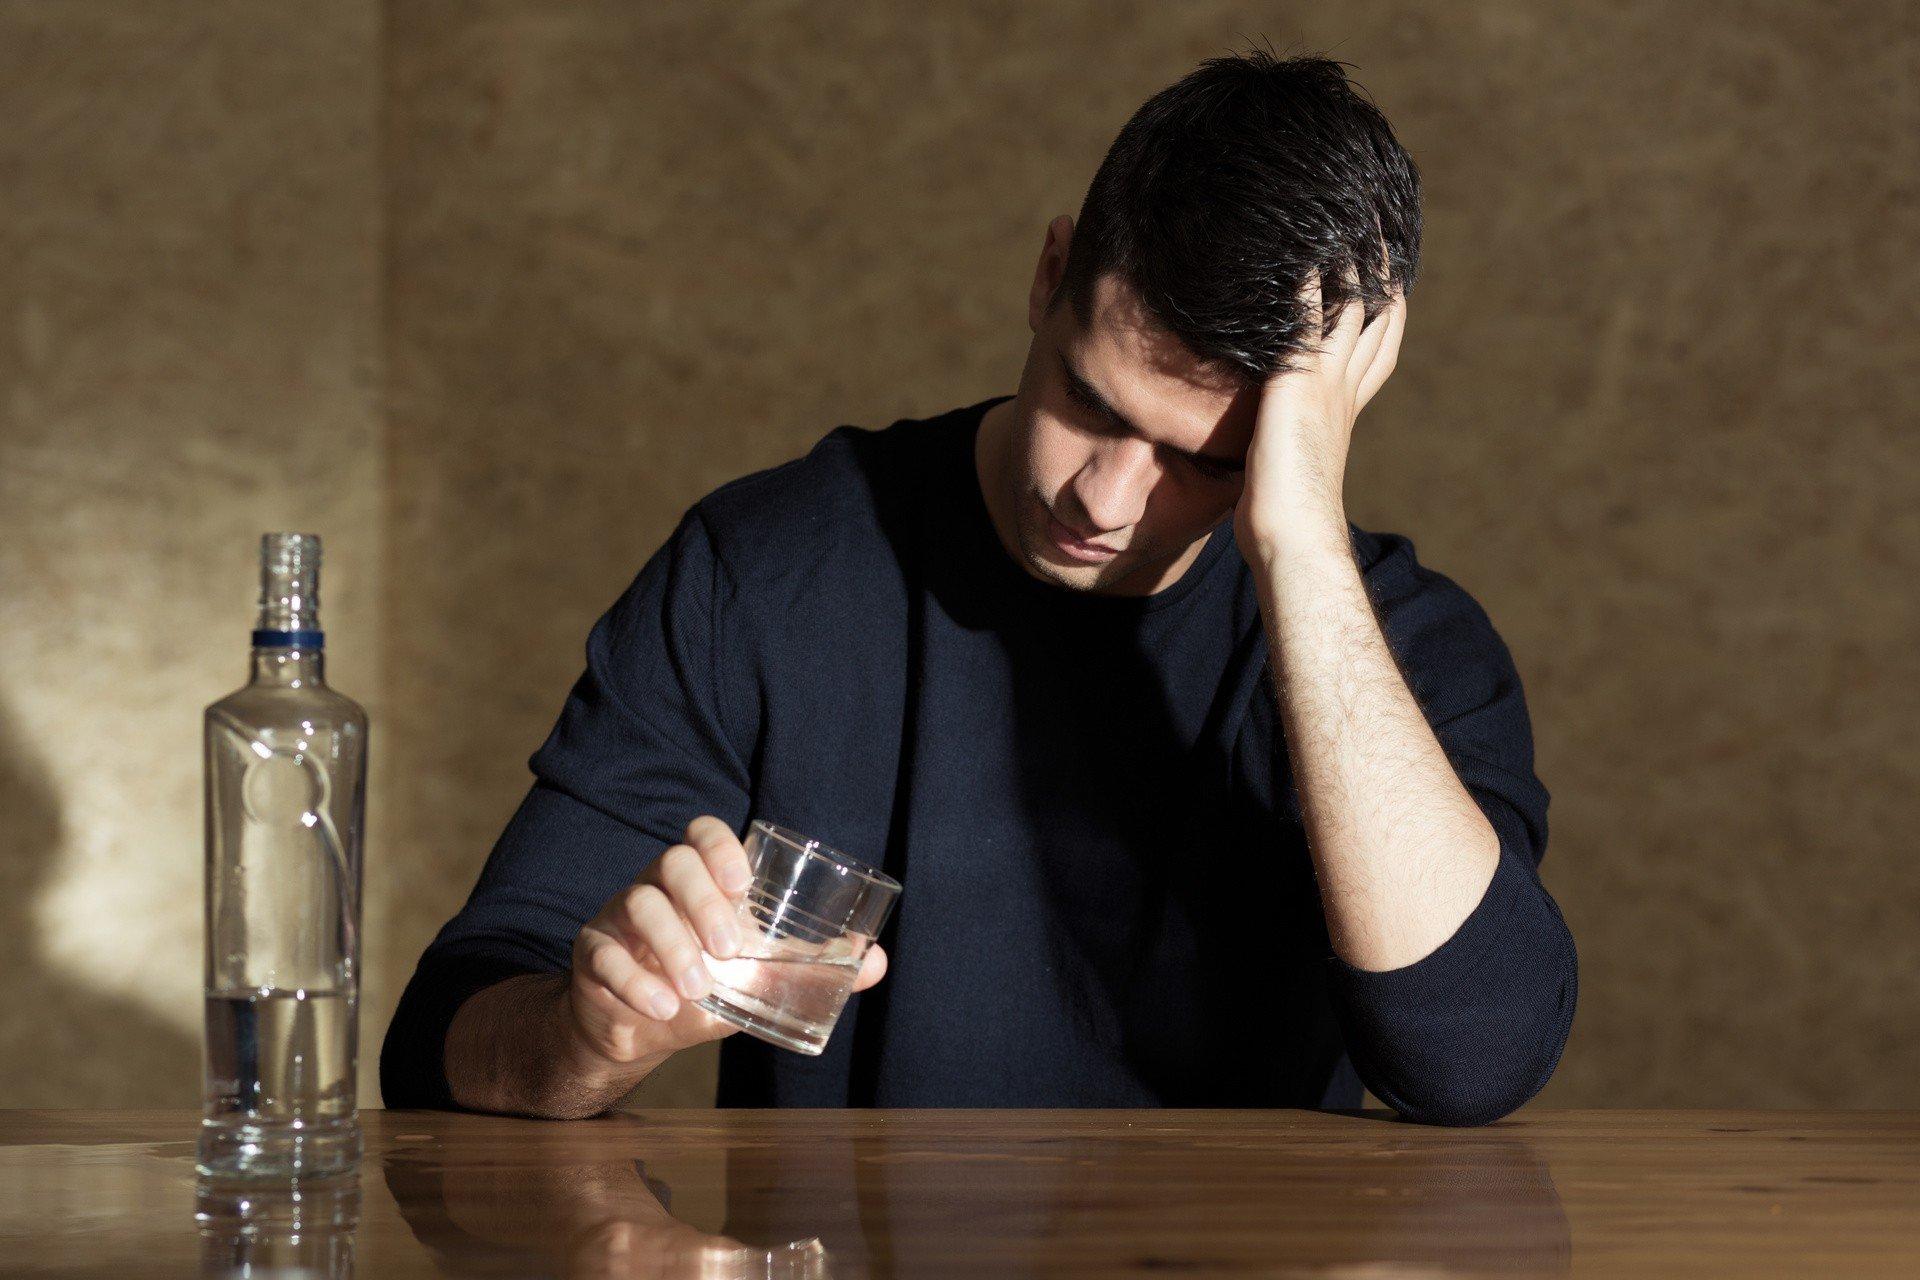 Jak schudnąć pijąc alkohol